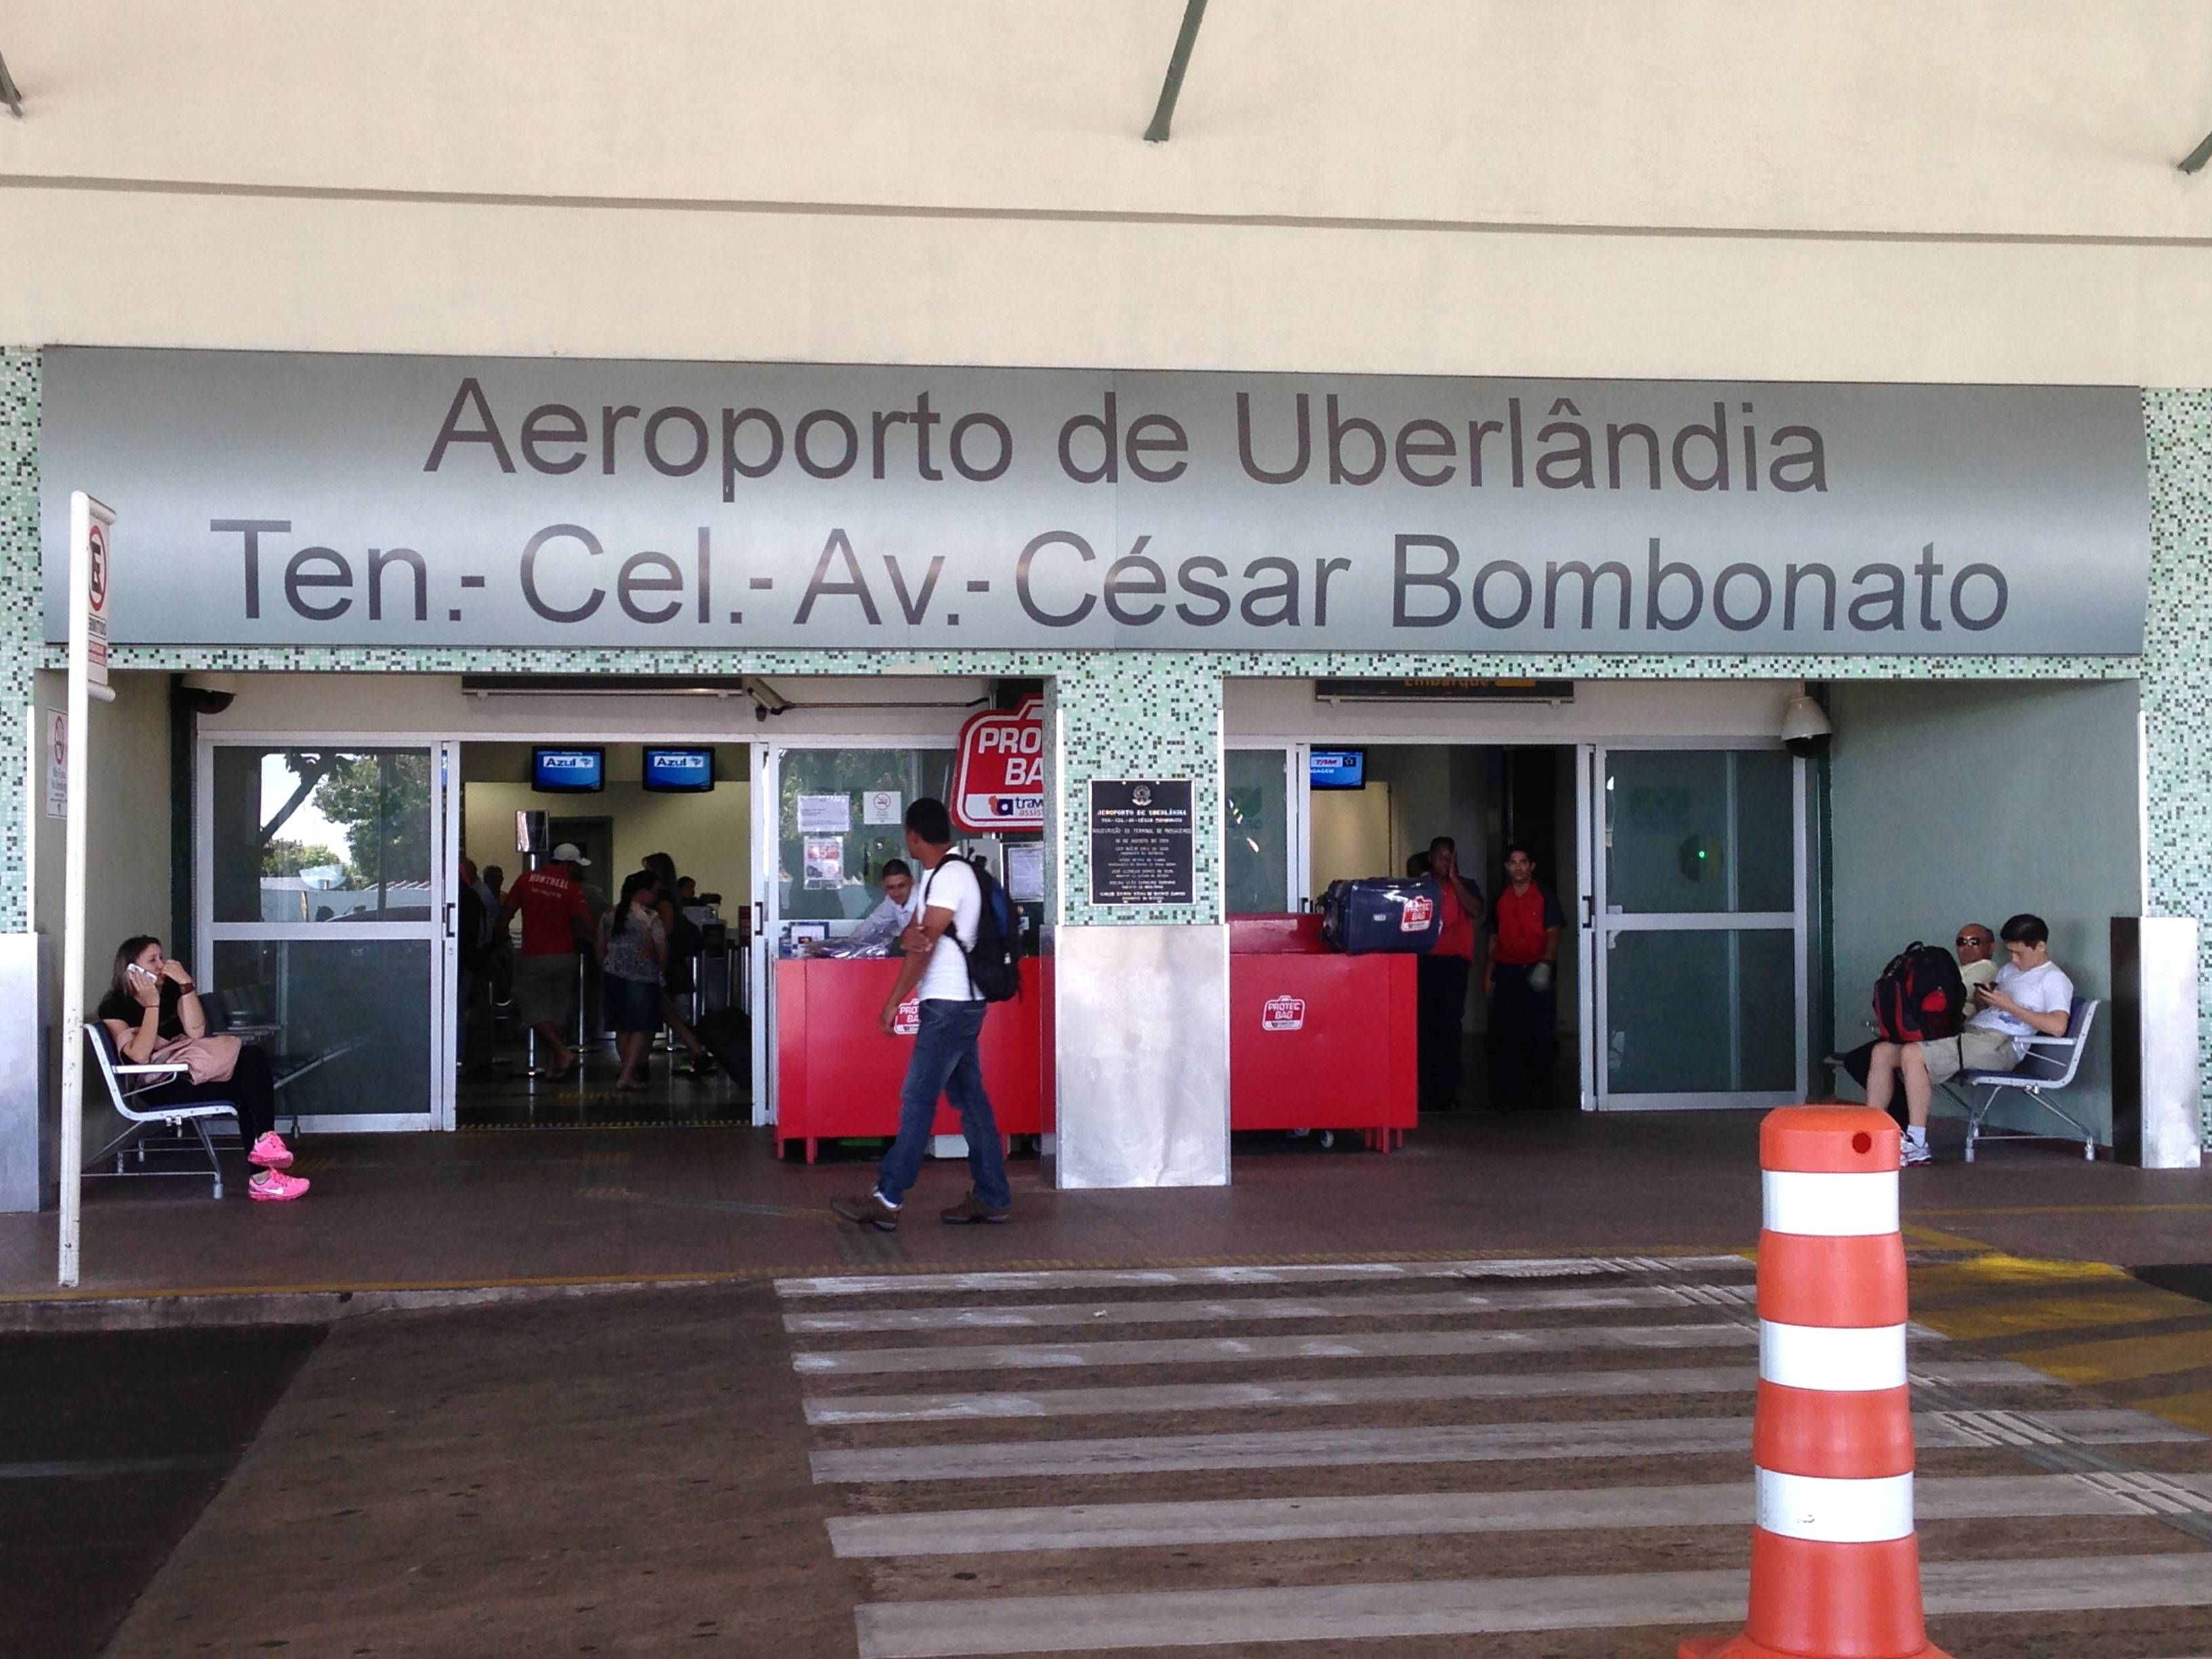 aeroporto uberlandia